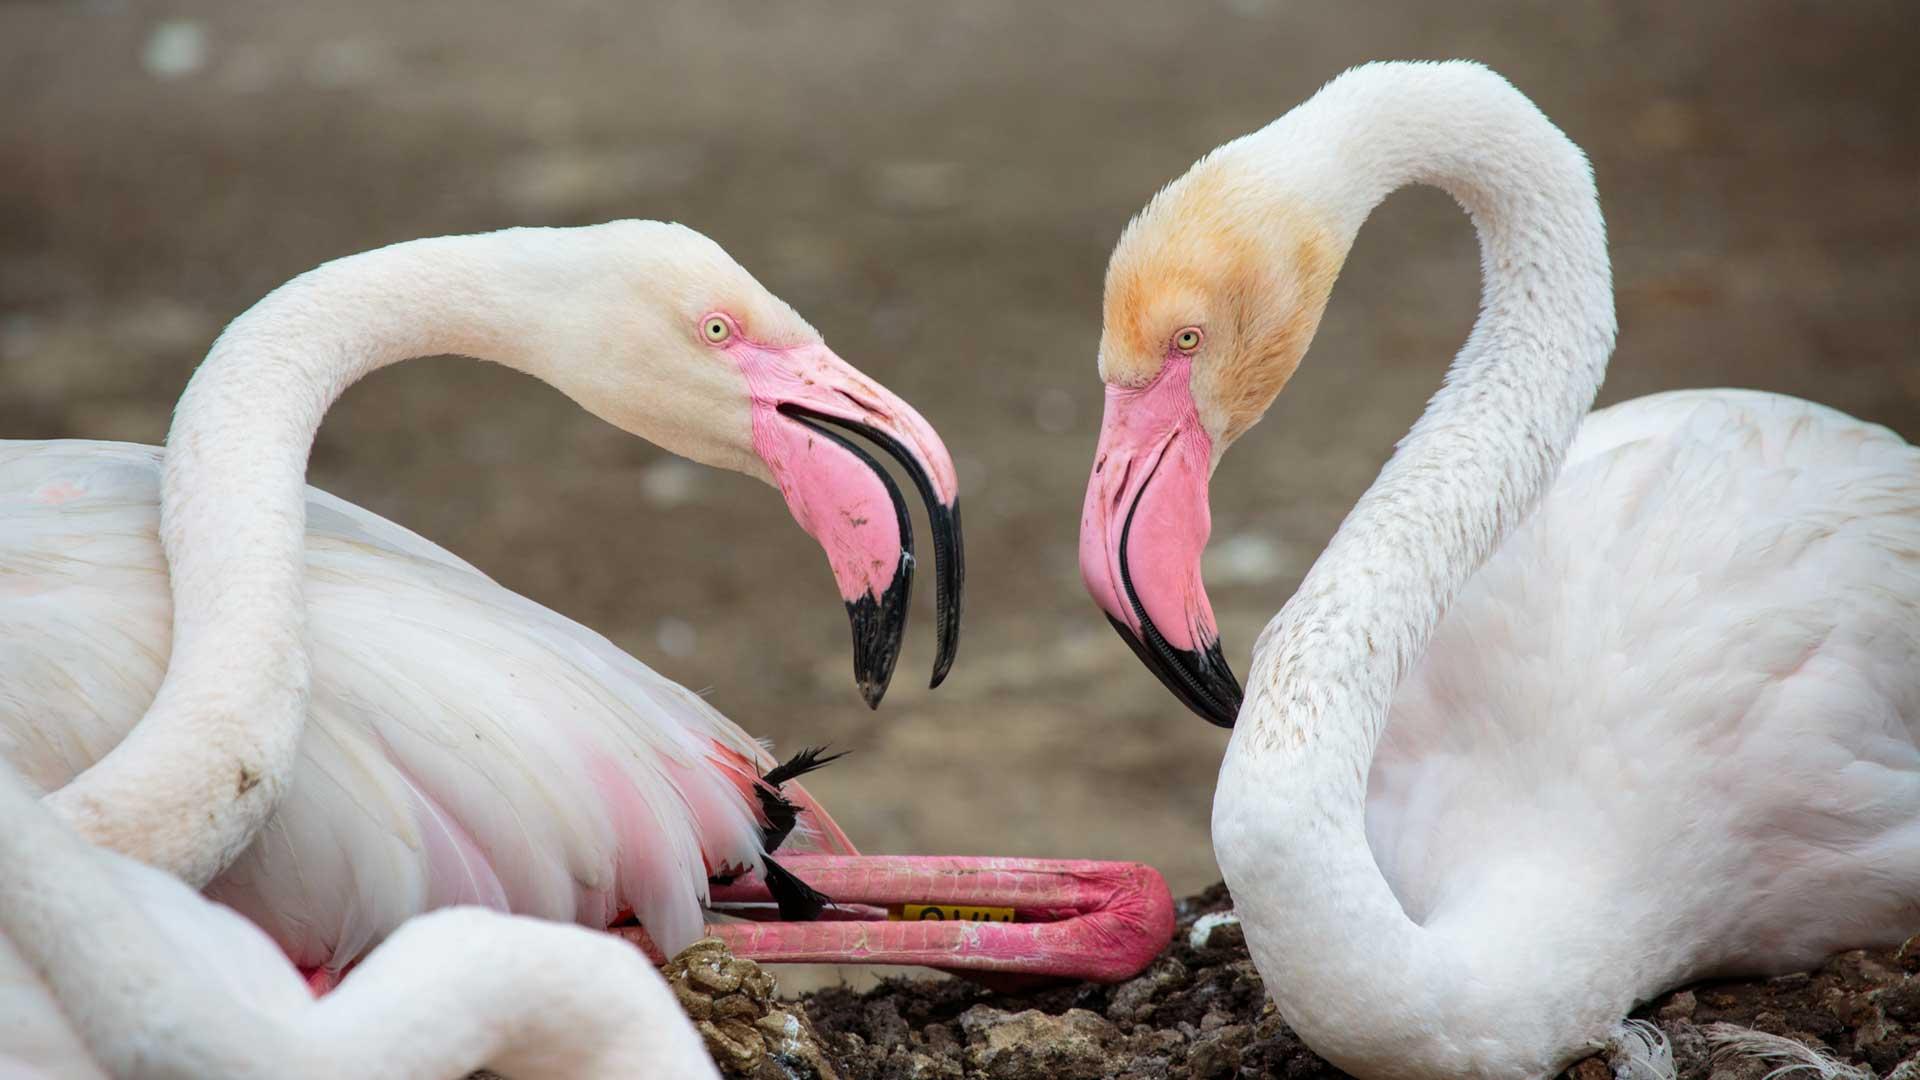 https://rfacdn.nz/zoo/assets/media/flamingo-chick-jan-2018-gallery-5.jpg